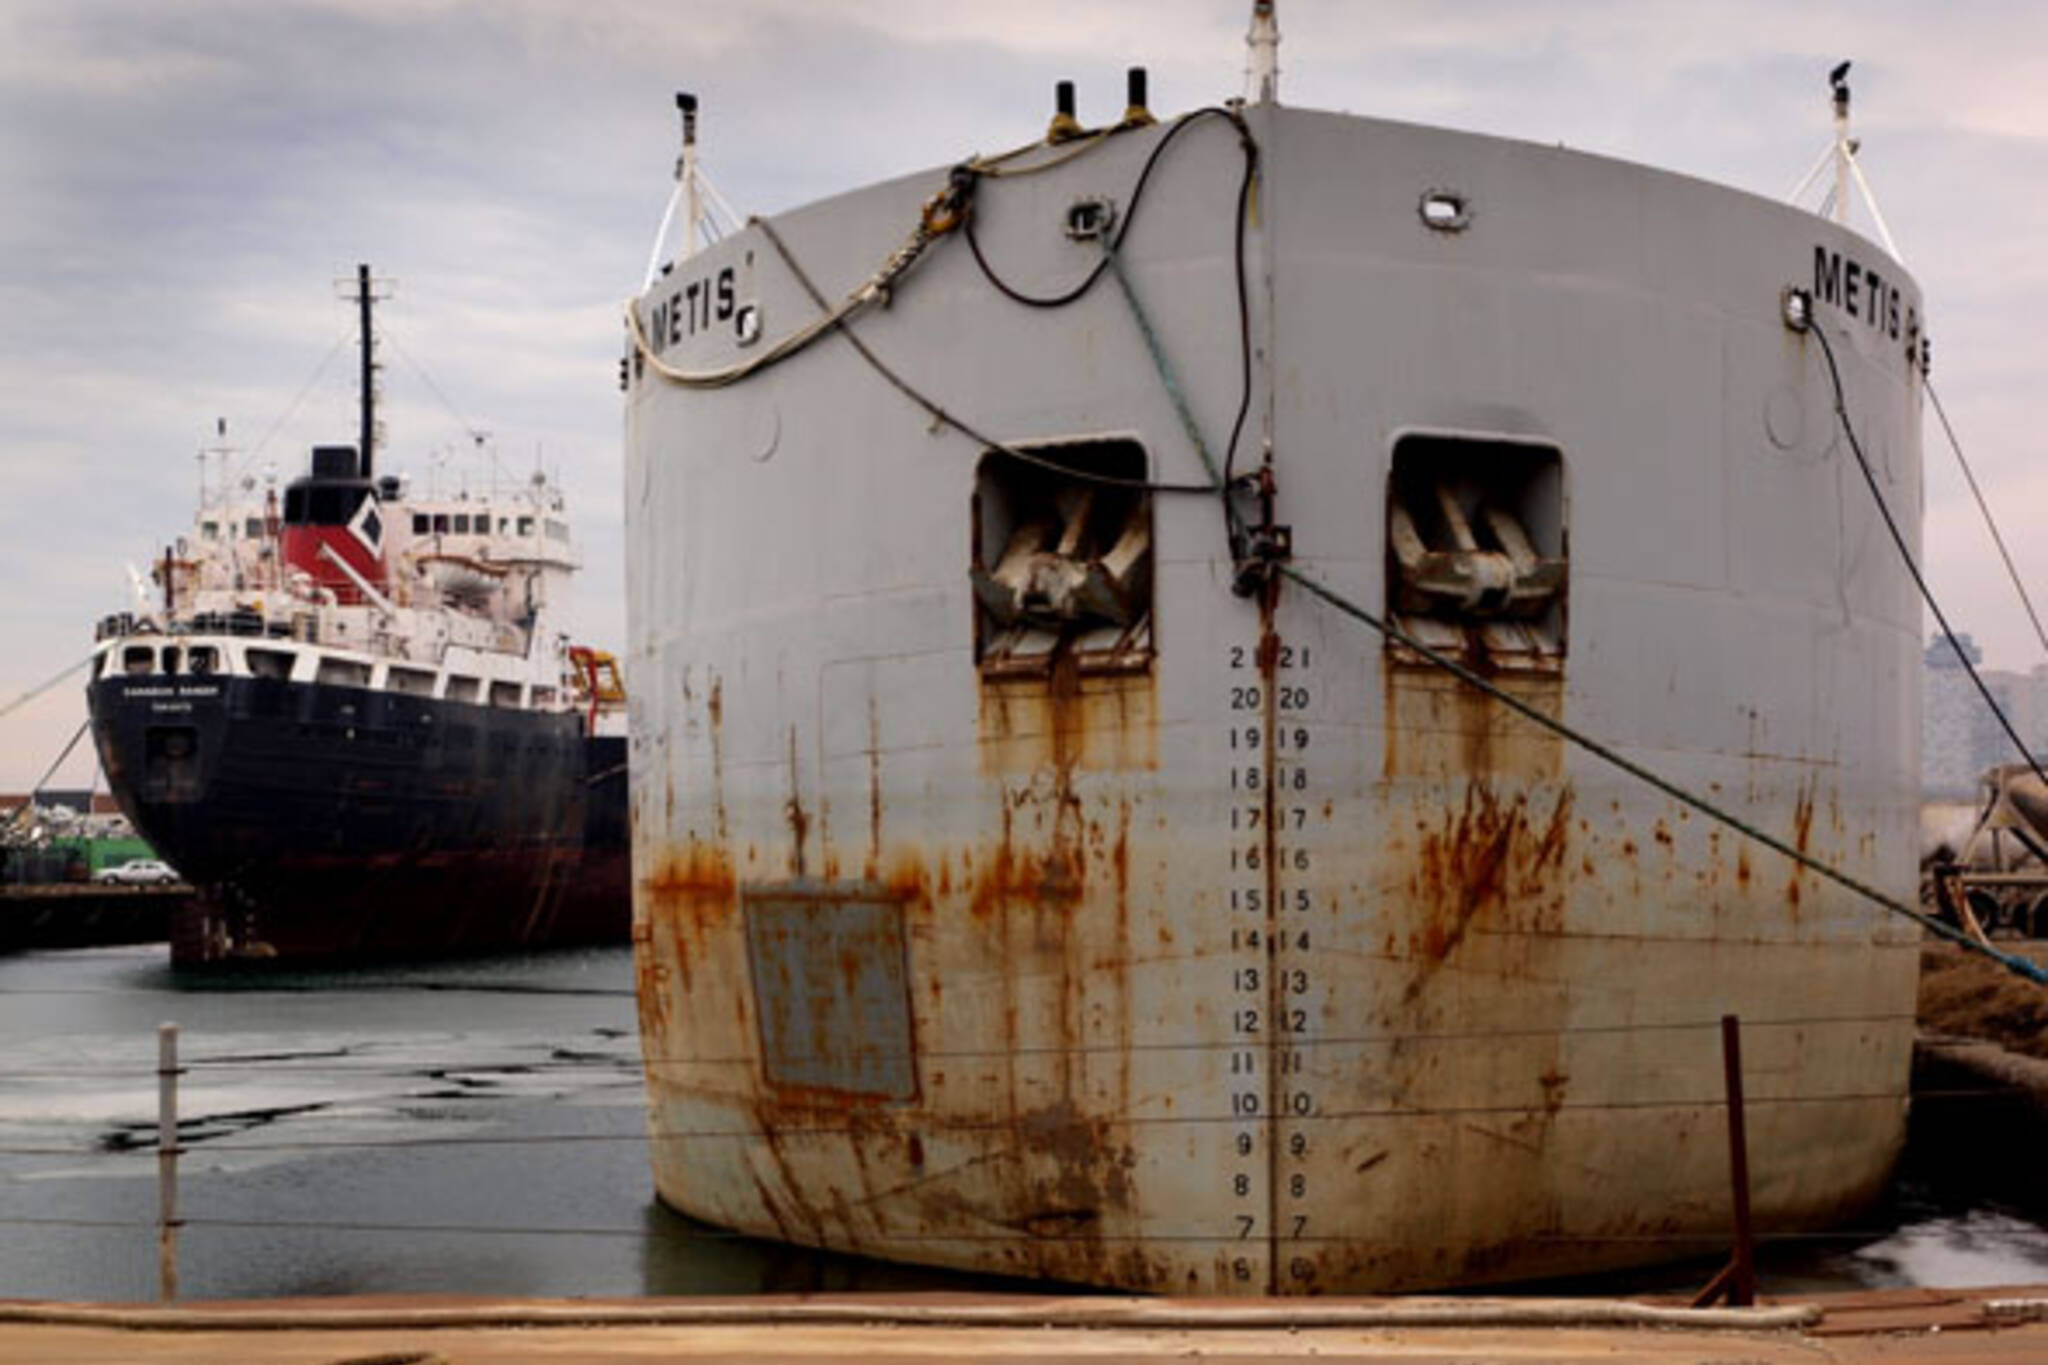 Ships at dockside near Polson Pier